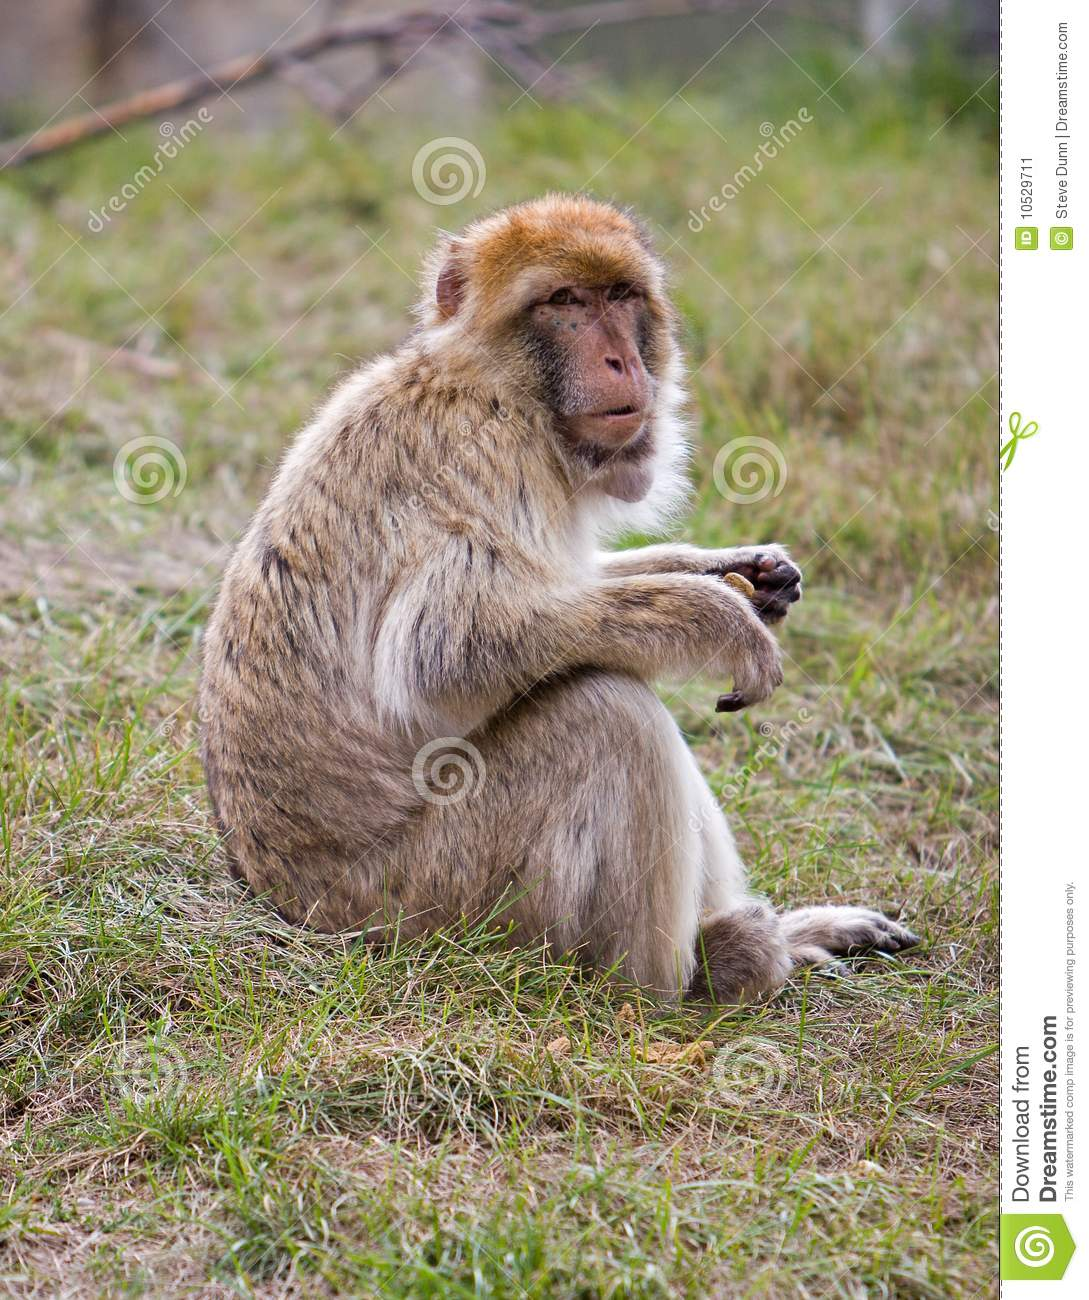 Barbary Ape Sitting On Grass Stock Image.